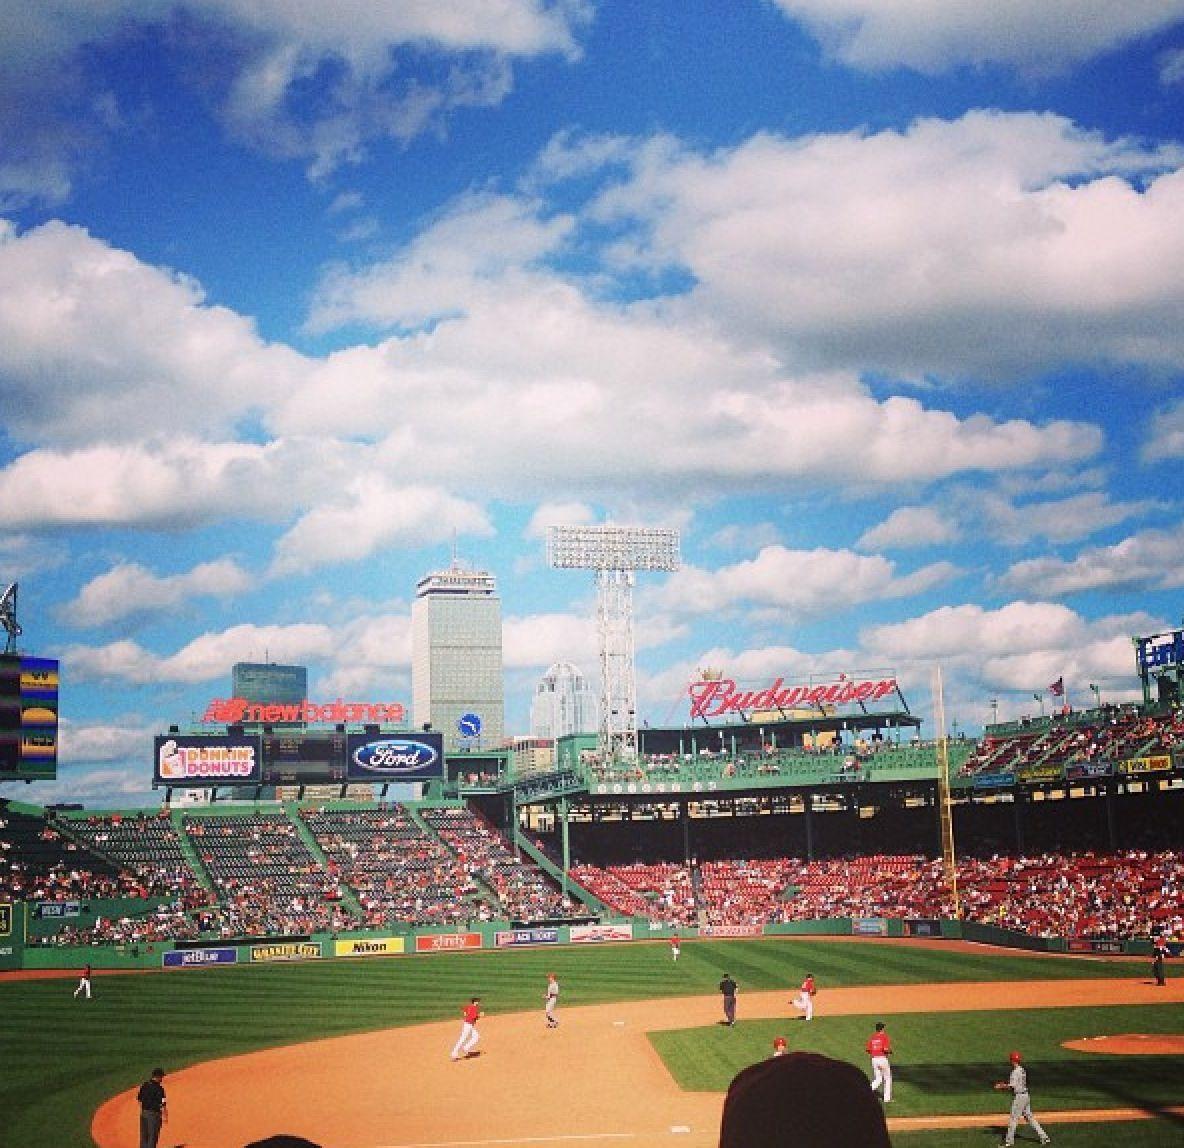 #boston #fenway #redsox #baseball #perfectday #clouds #pretty #sports